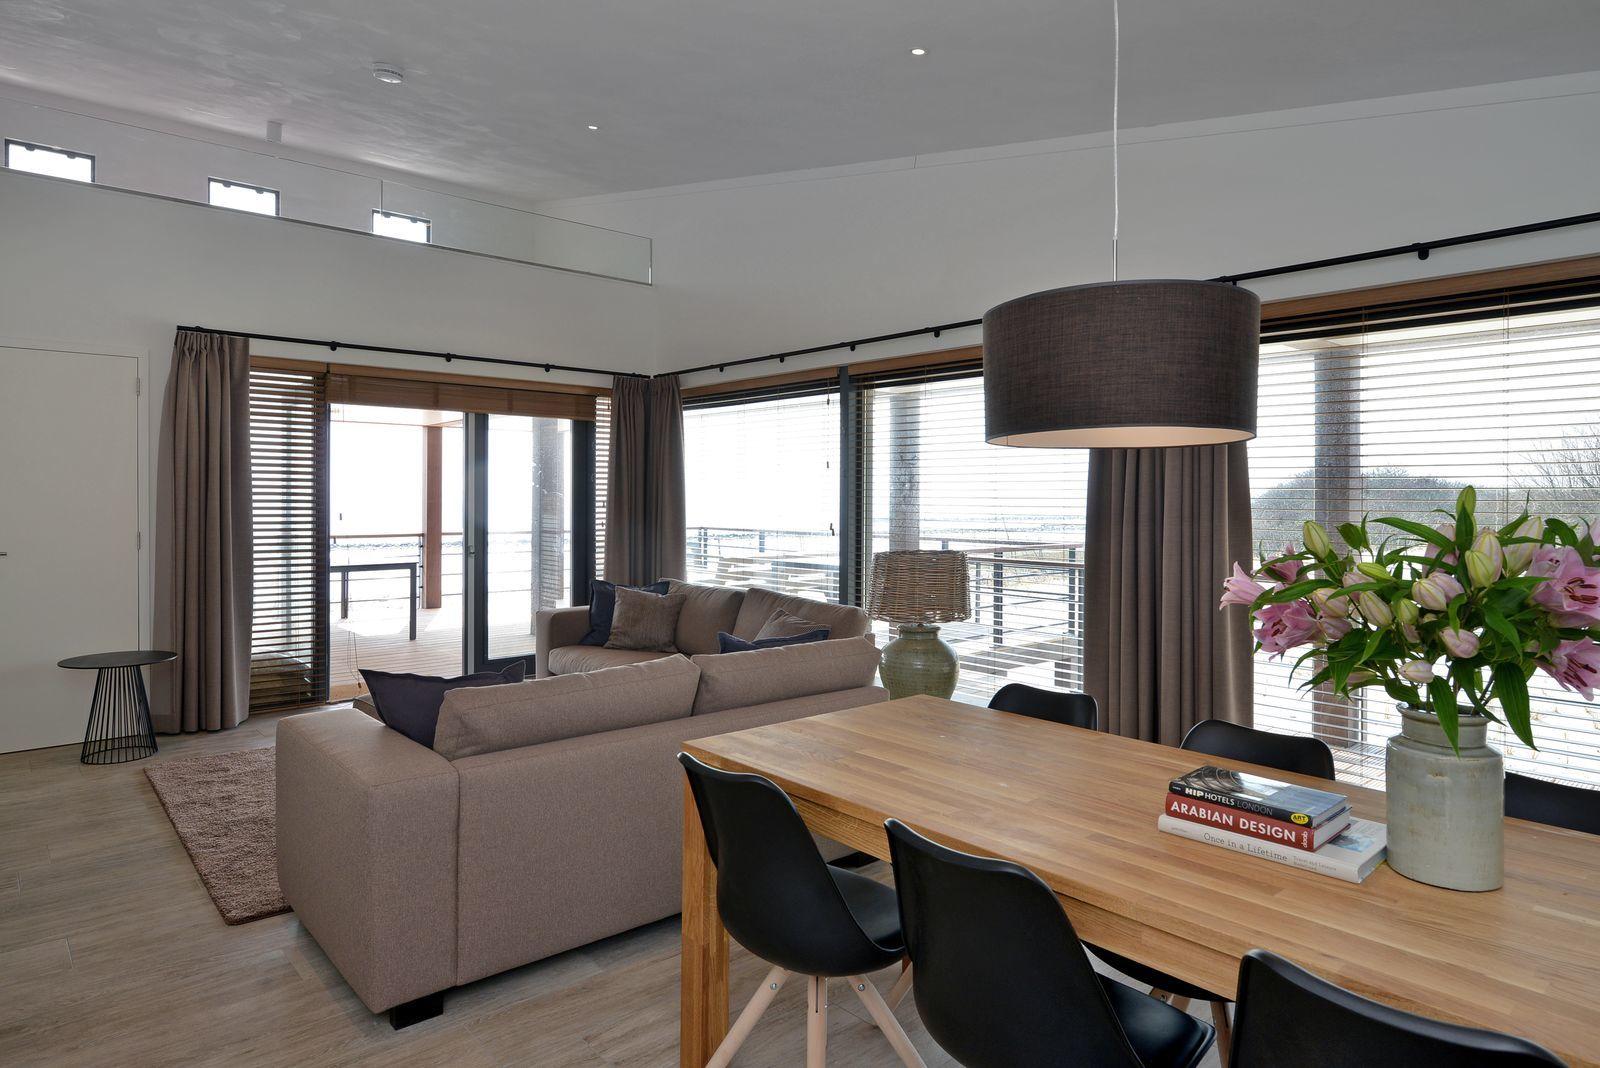 6-Personen Villa Comfort